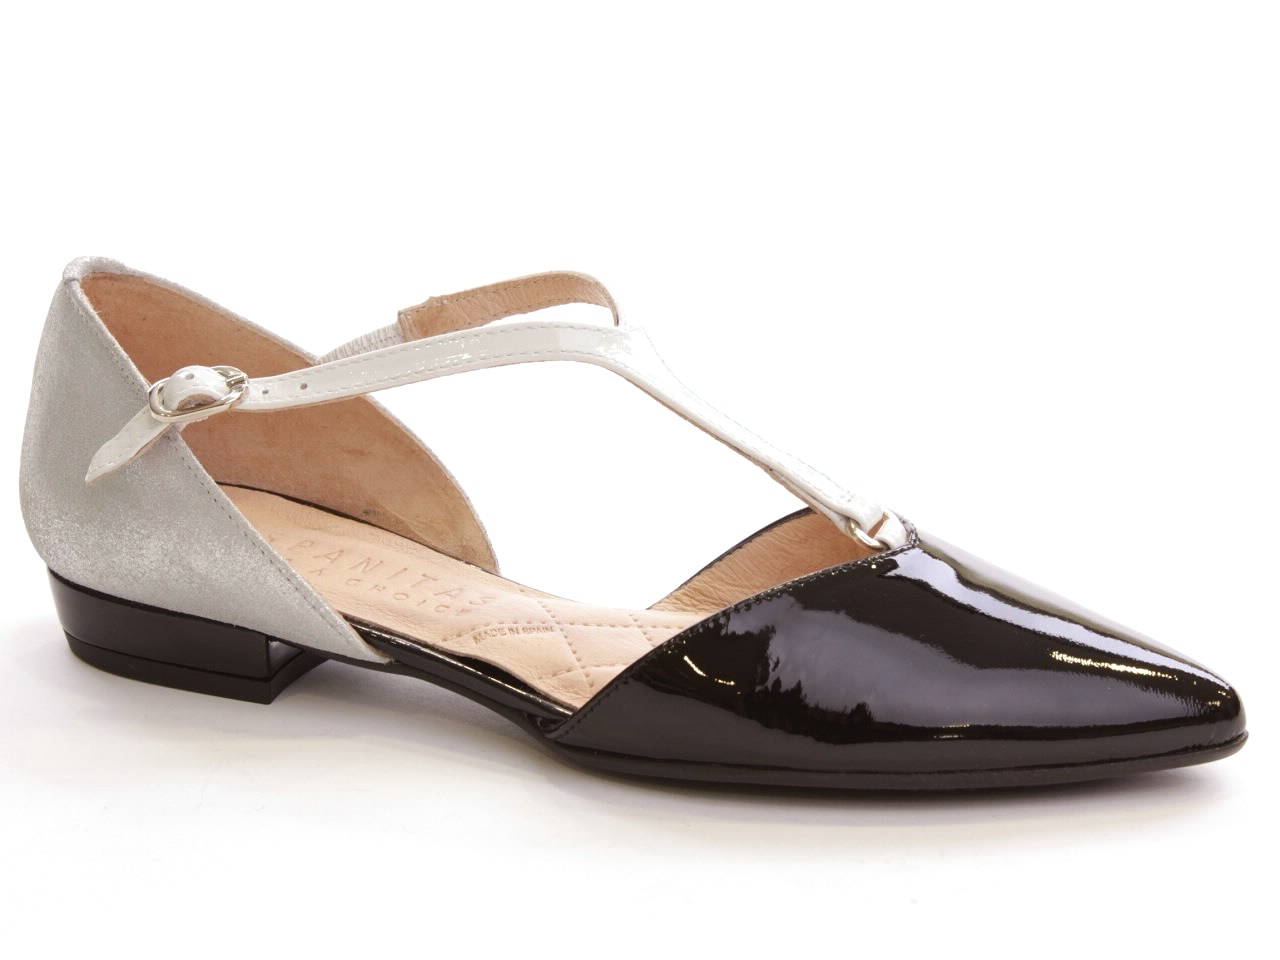 Flat Shoes, Ballerinas, Mocassins Hispanitas - 165 CHV51191